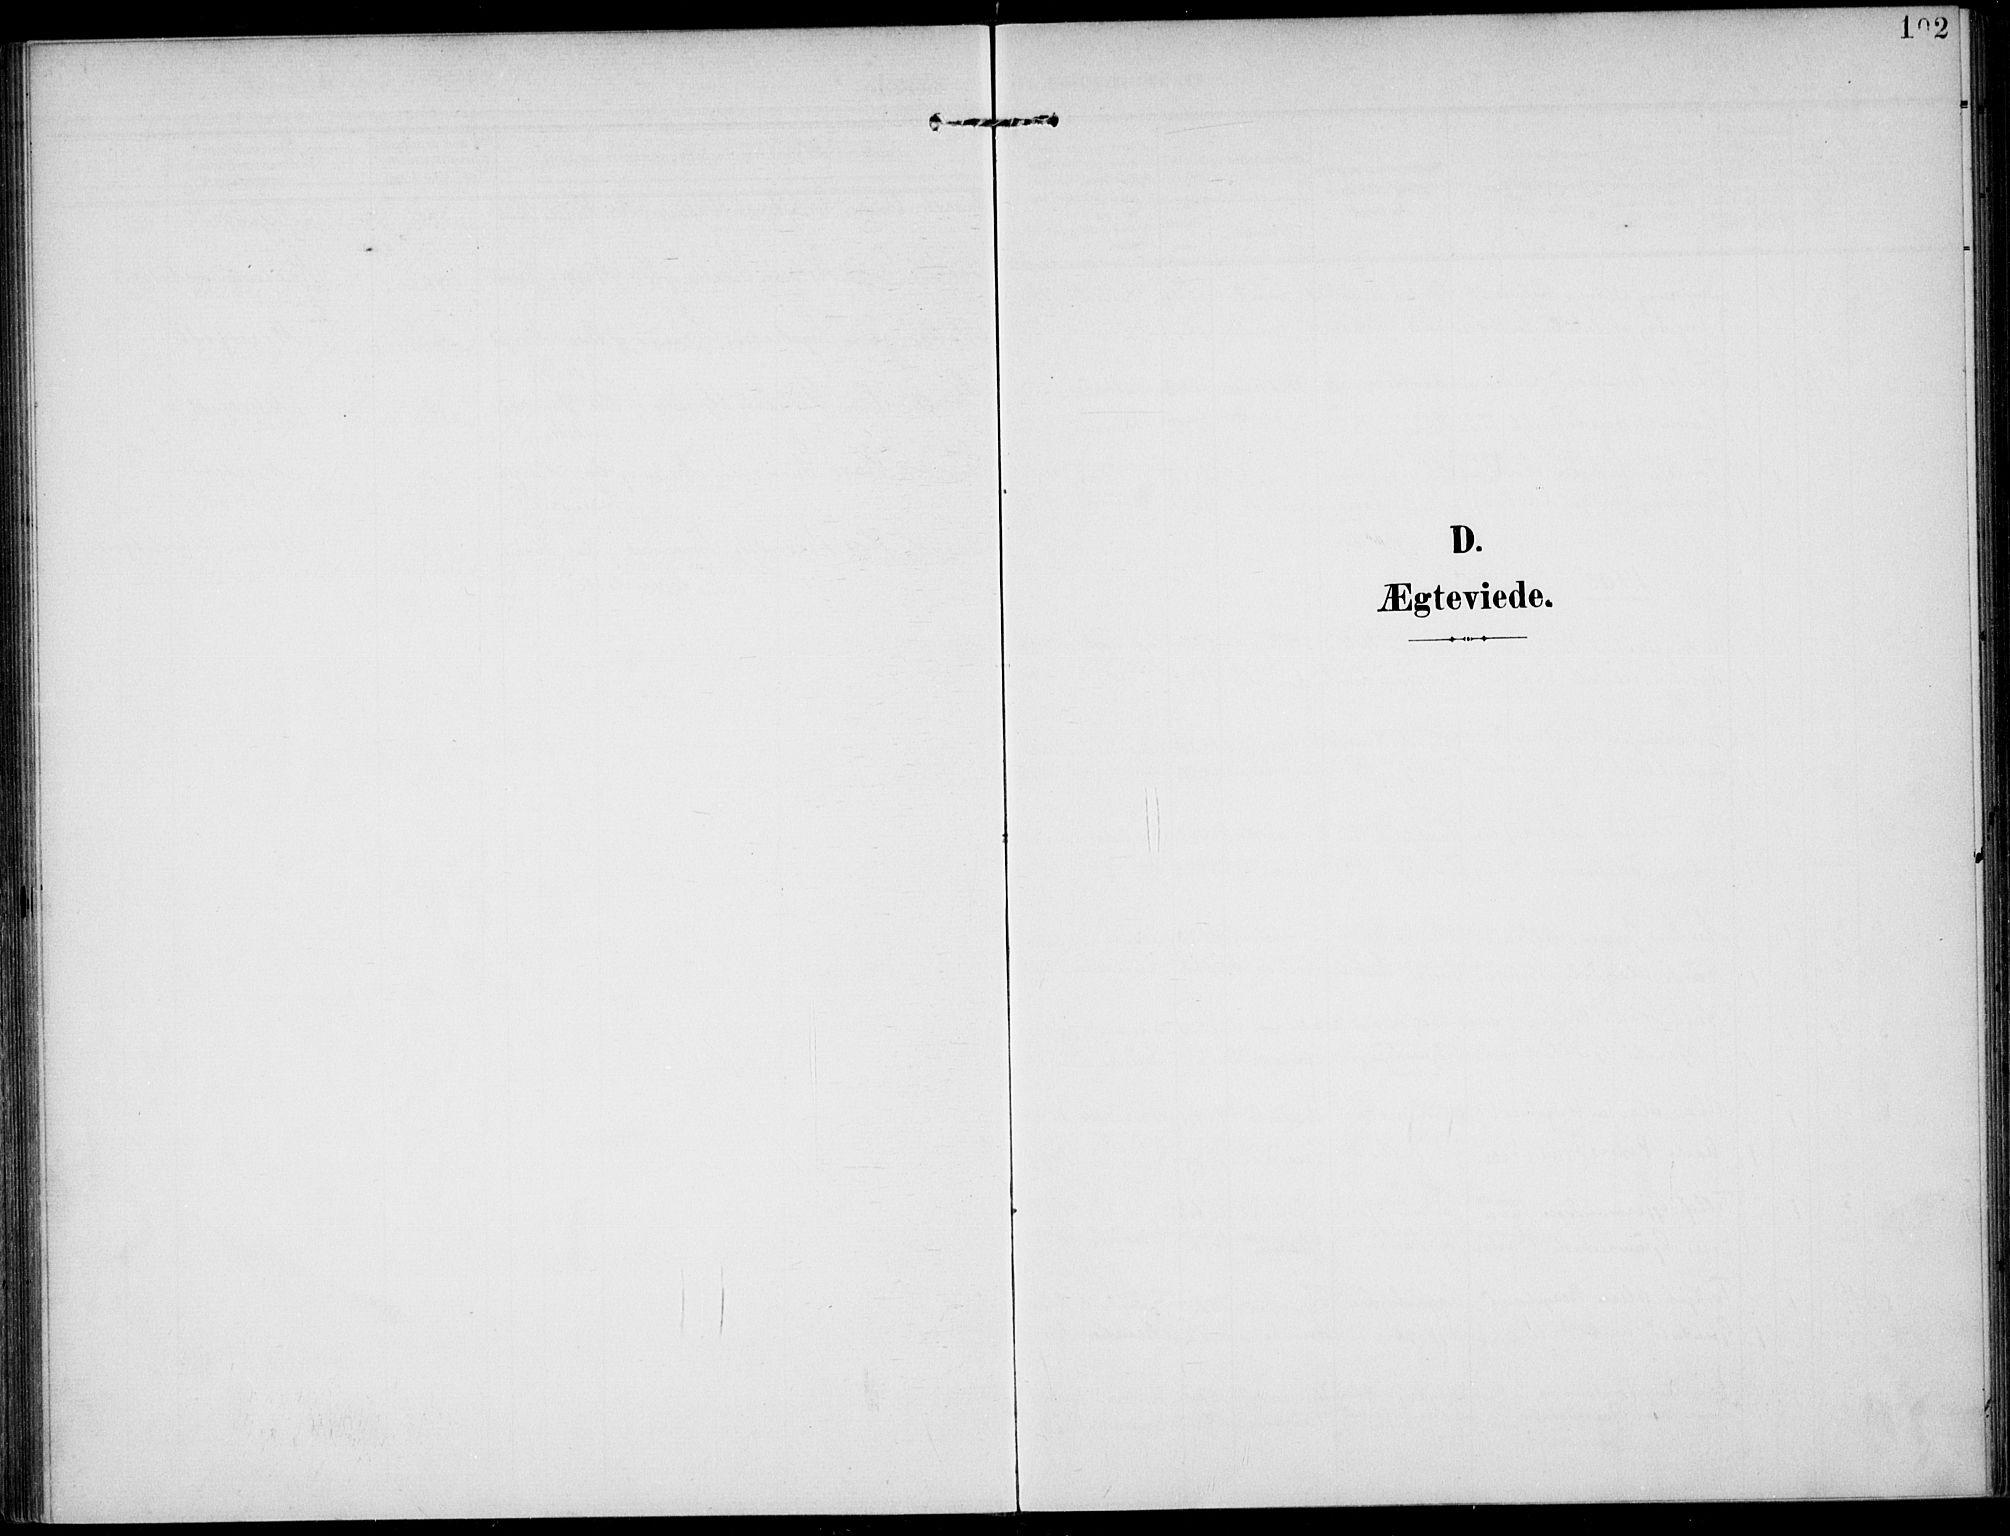 SAKO, Lunde kirkebøker, F/Fa/L0004: Ministerialbok nr. I 4, 1902-1913, s. 102